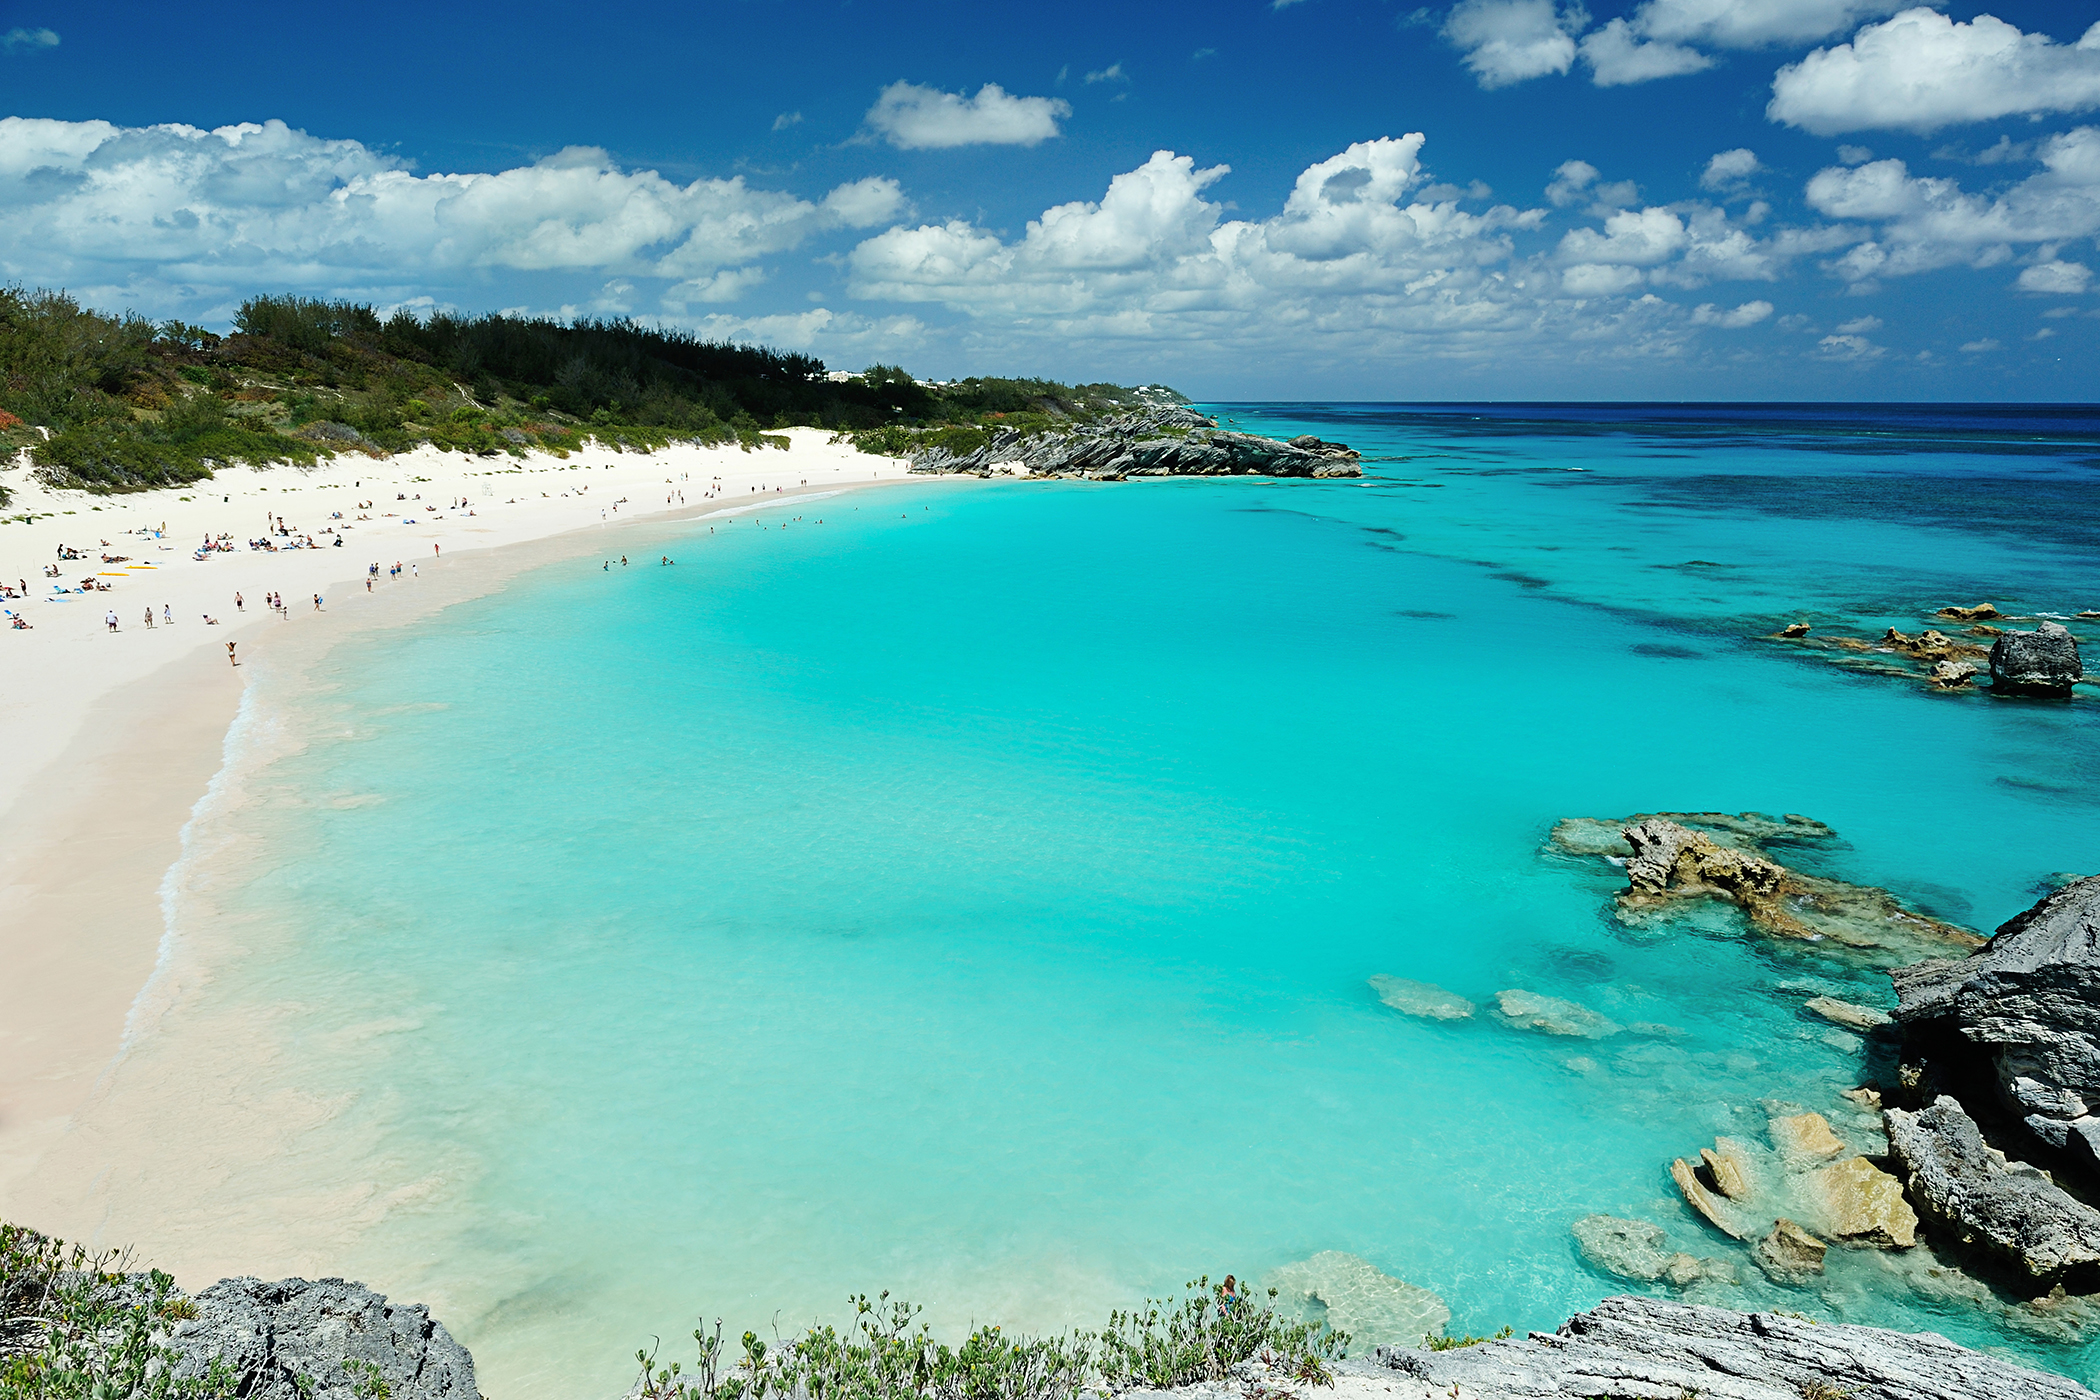 bermuda beach and bay.